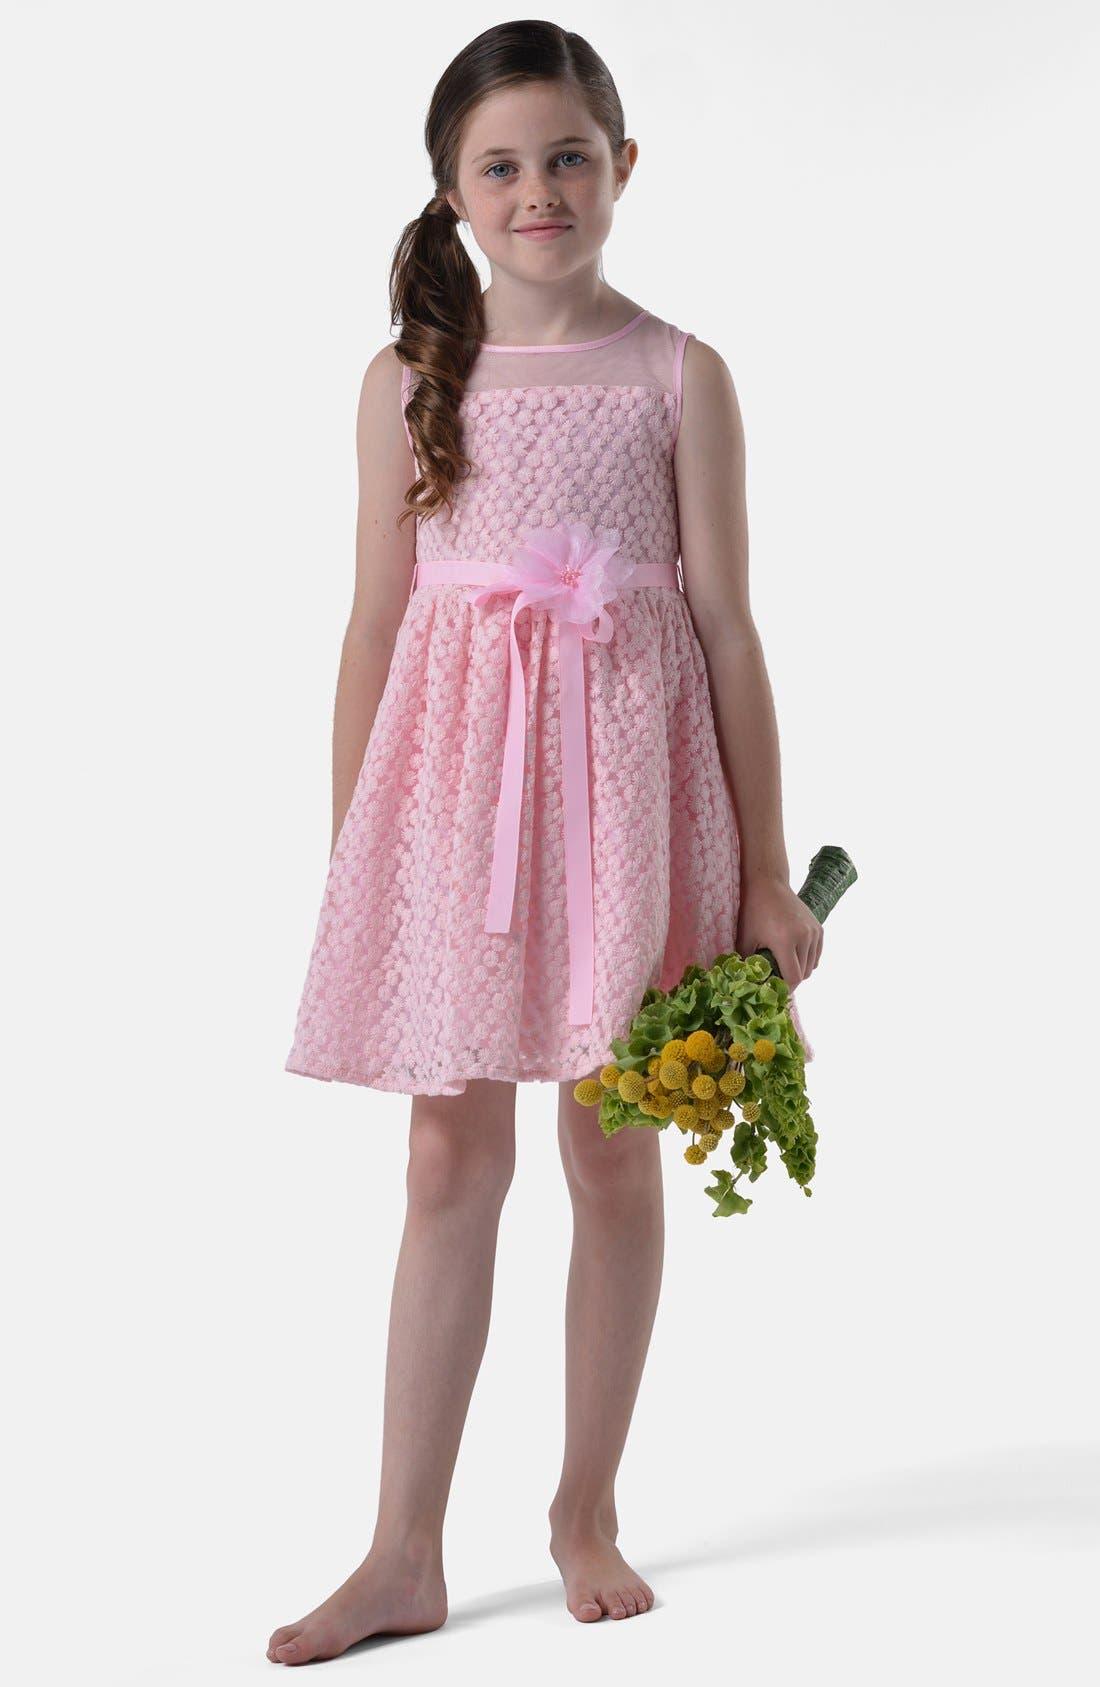 Alternate Image 1 Selected - Us Angels 'Daisy' Illusion Neck Sleeveless Dress (Little Girls & Big Girls)